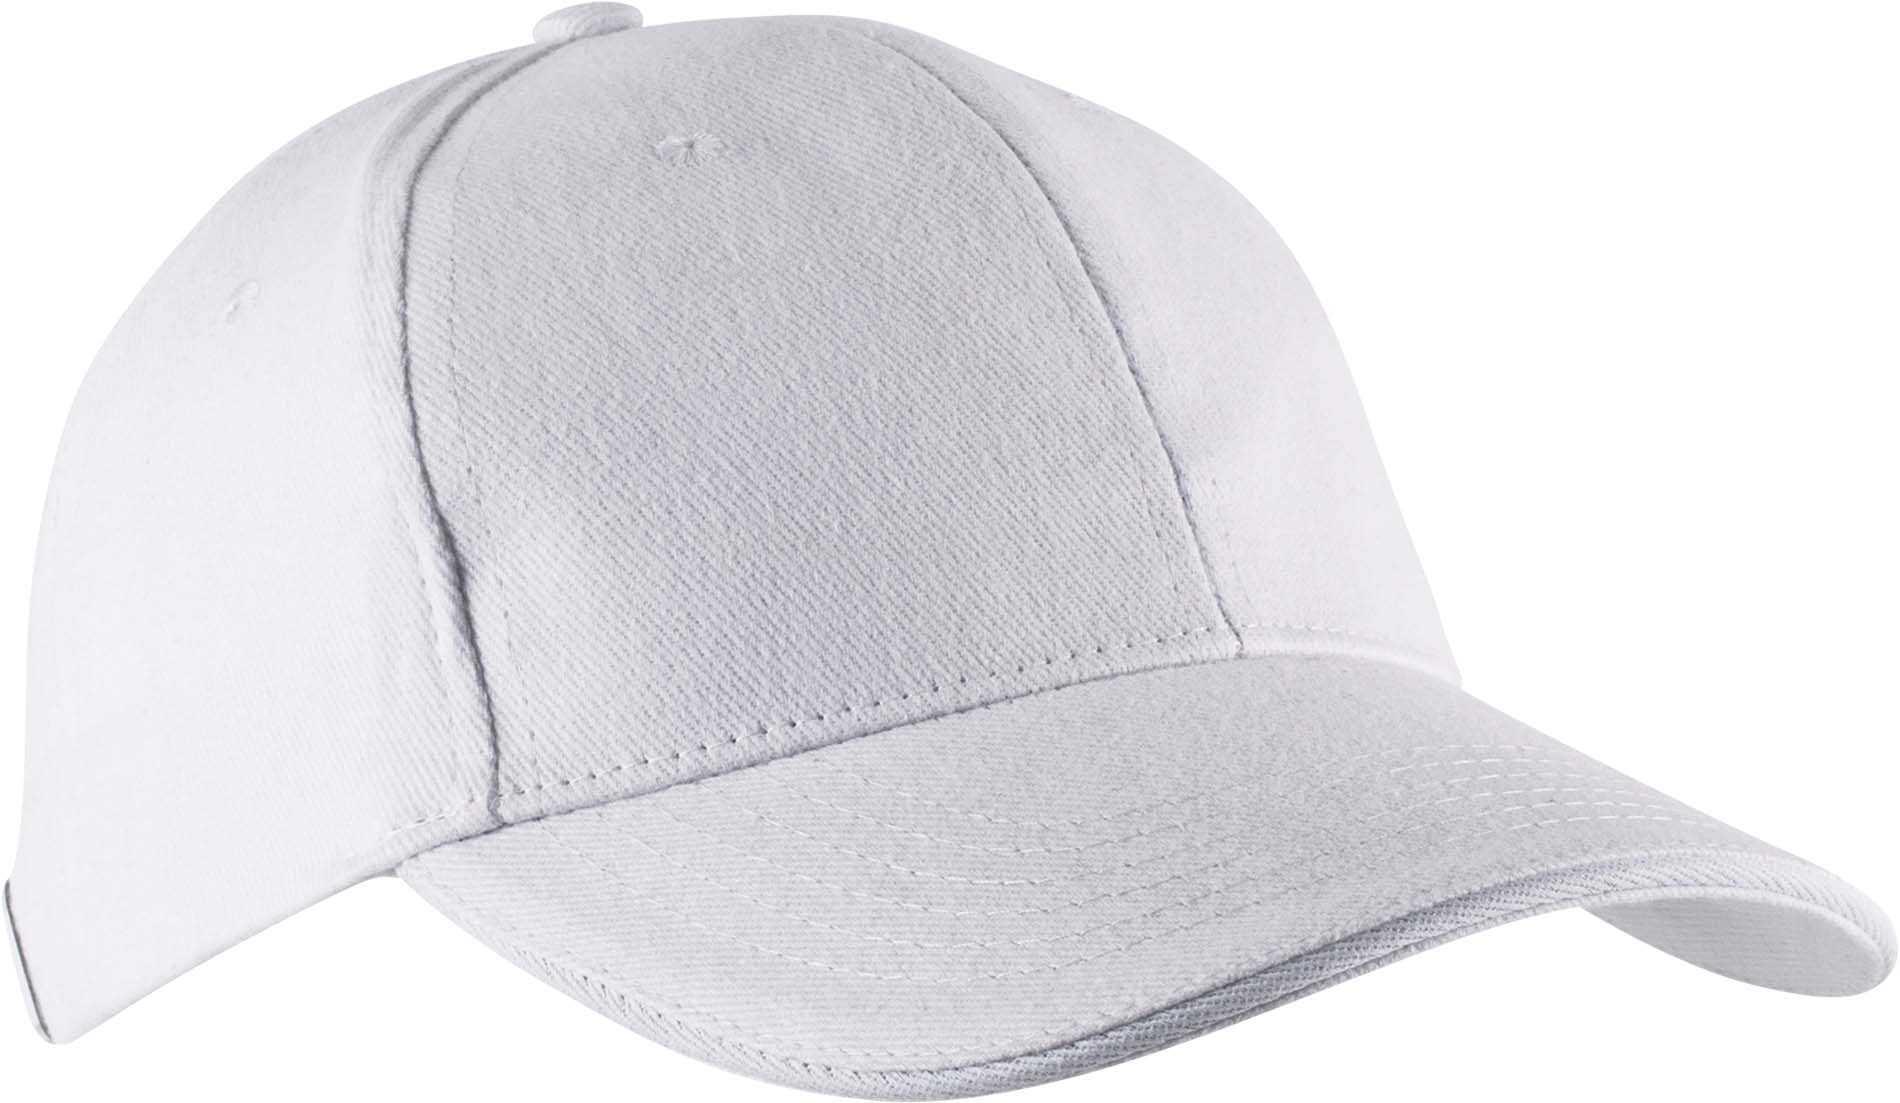 casquette blanche pas cher